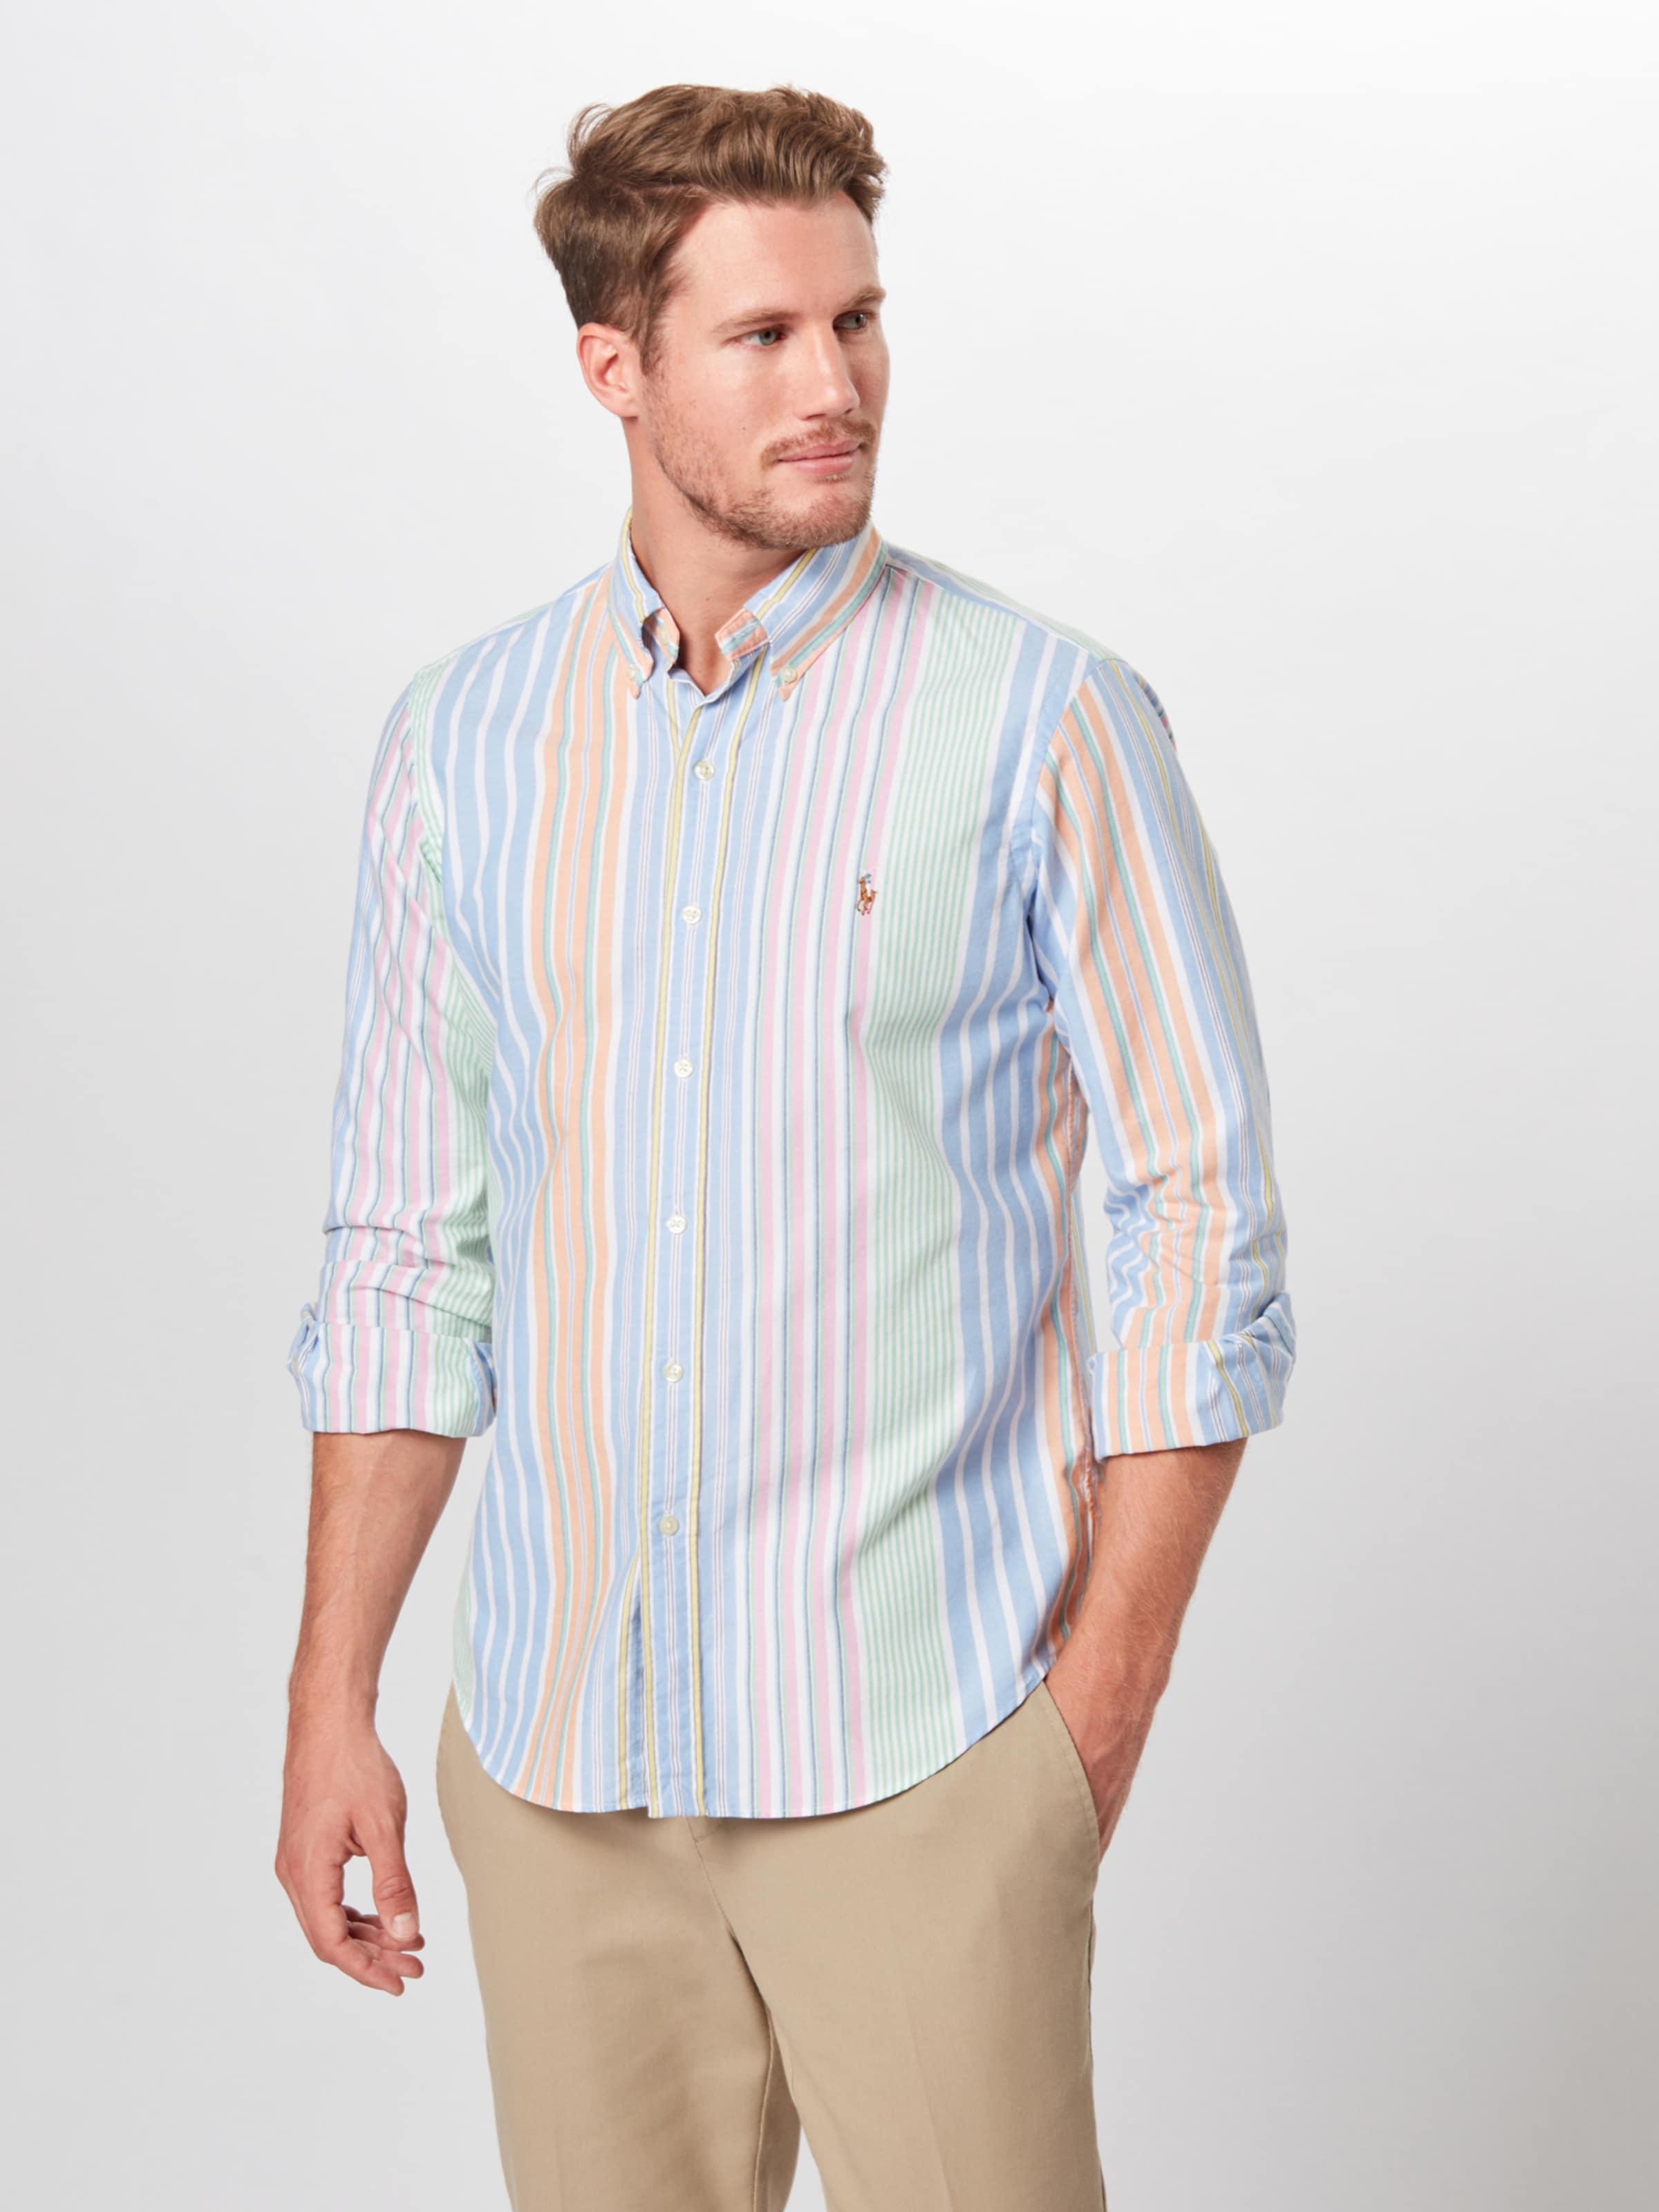 sport Sleeve Polo Shirt' Spt In long Lauren Hellorange Hemd BlauHellgrün Altrosa 'bd Ppc Ralph Yfy76gvIb